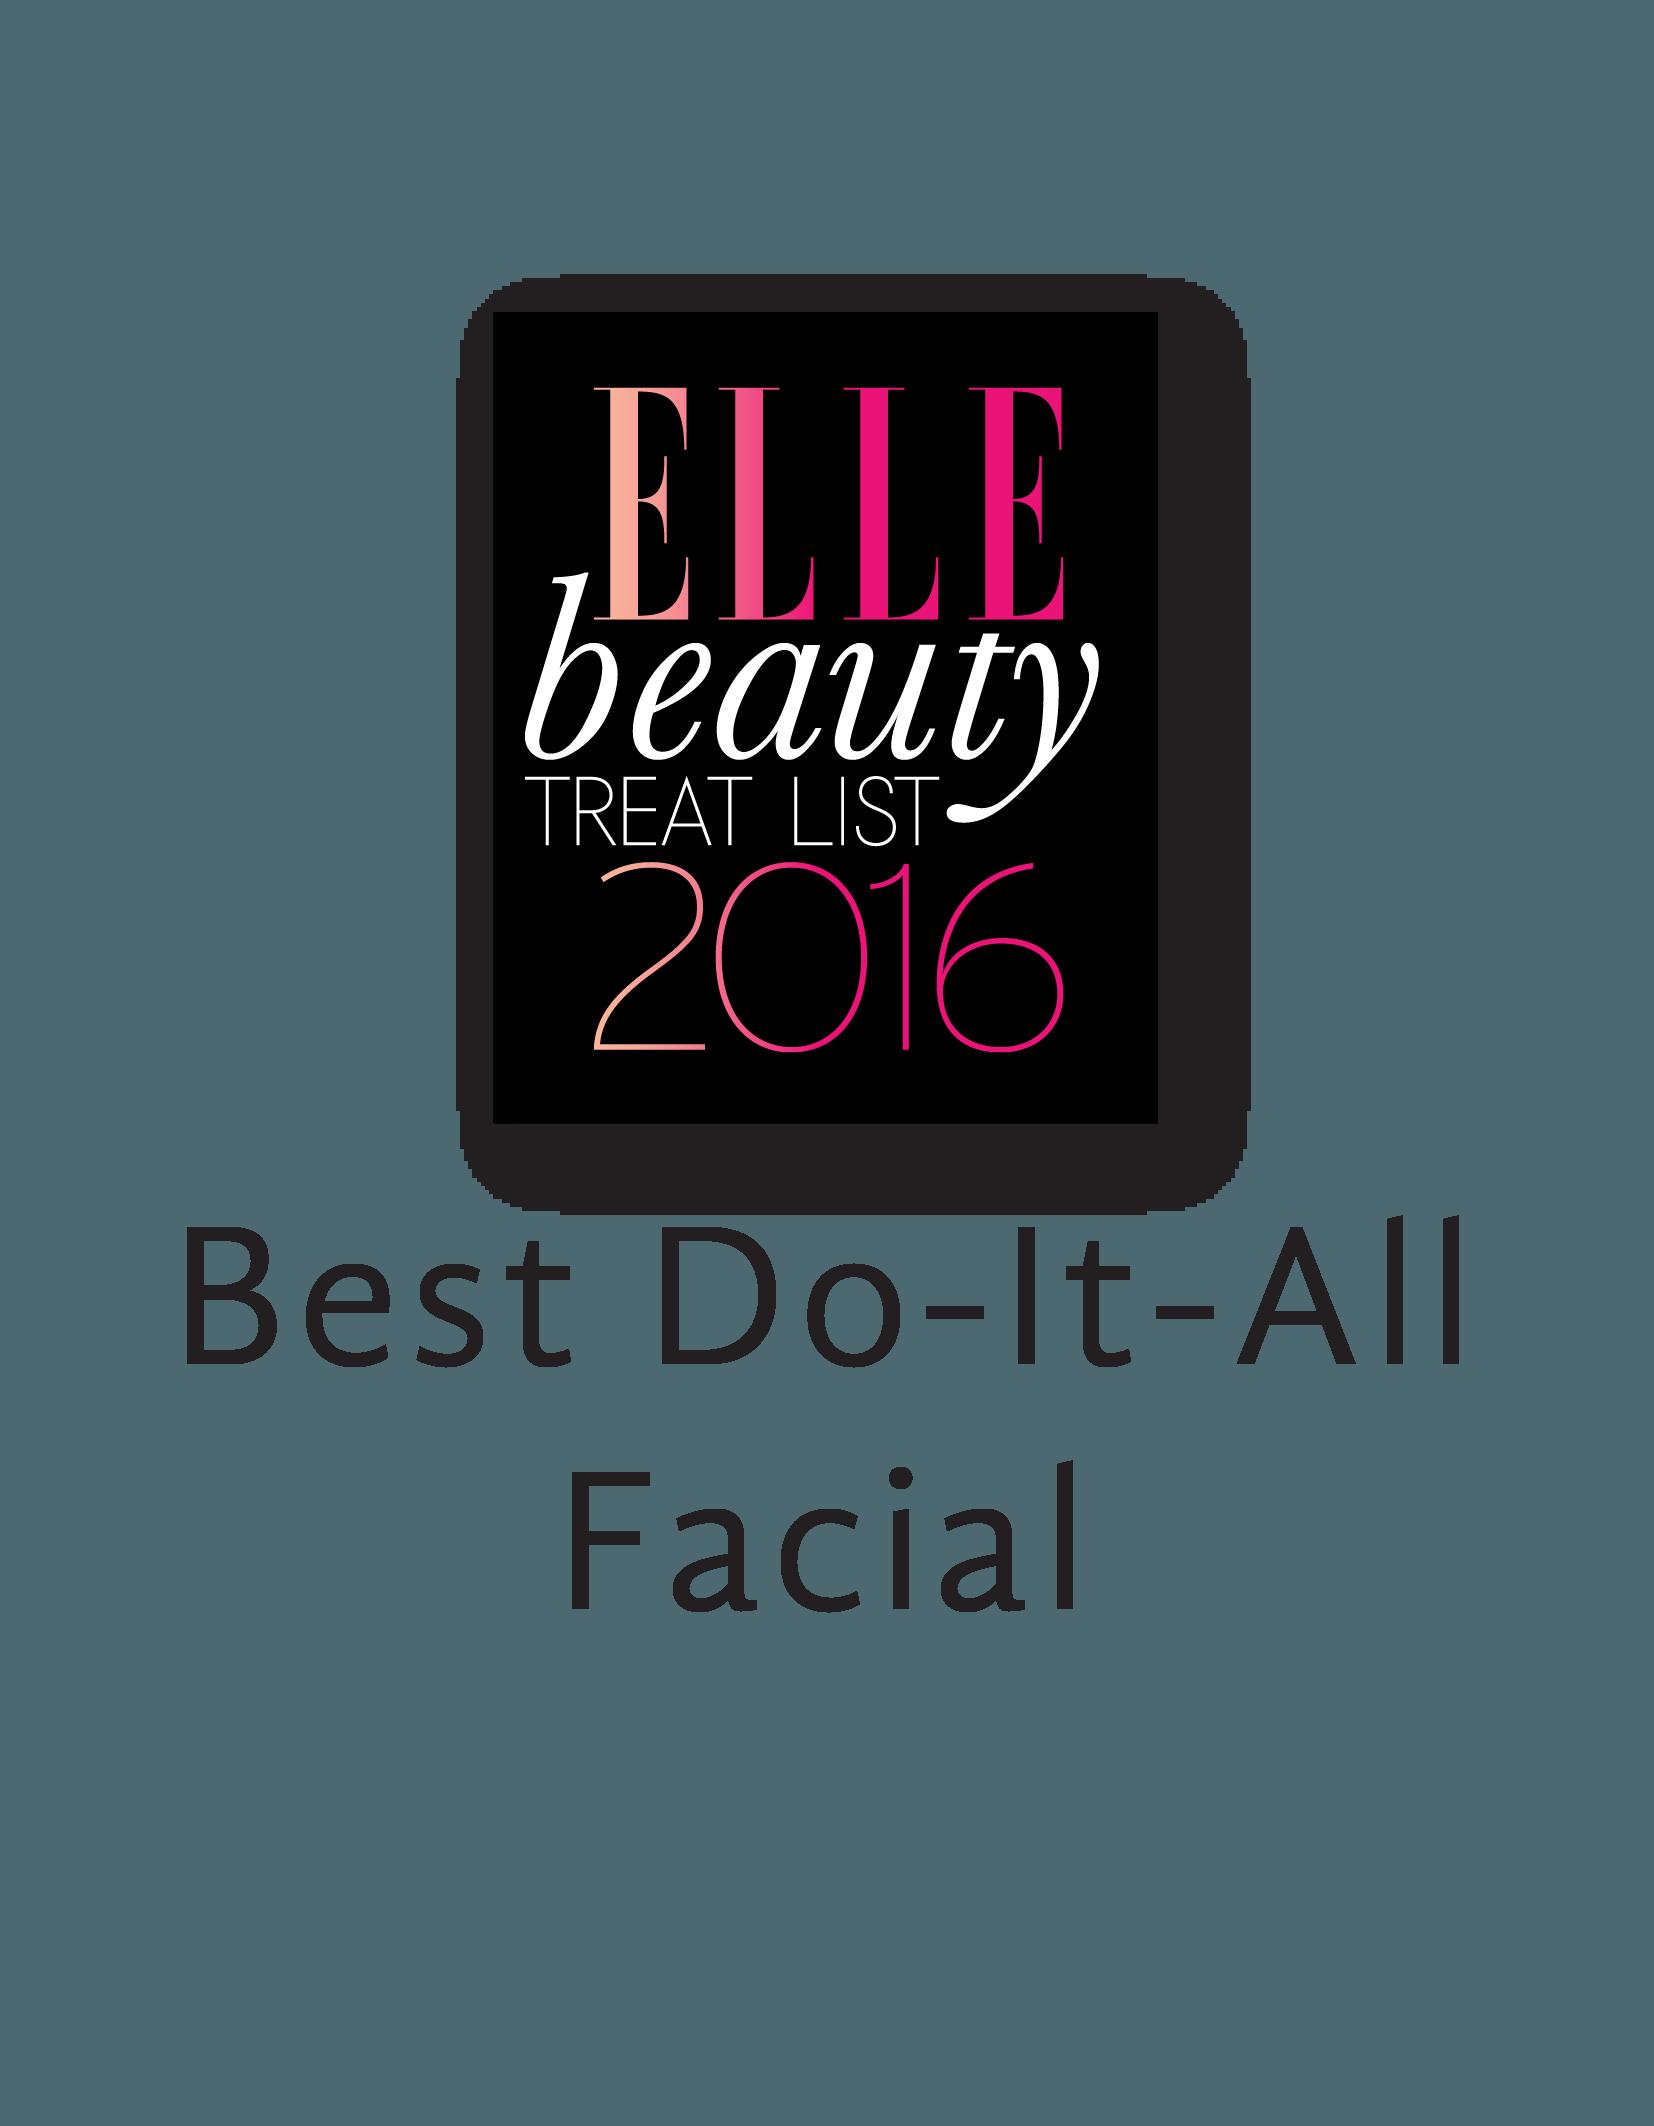 ELLE_Best Do-It-All Facial 2016